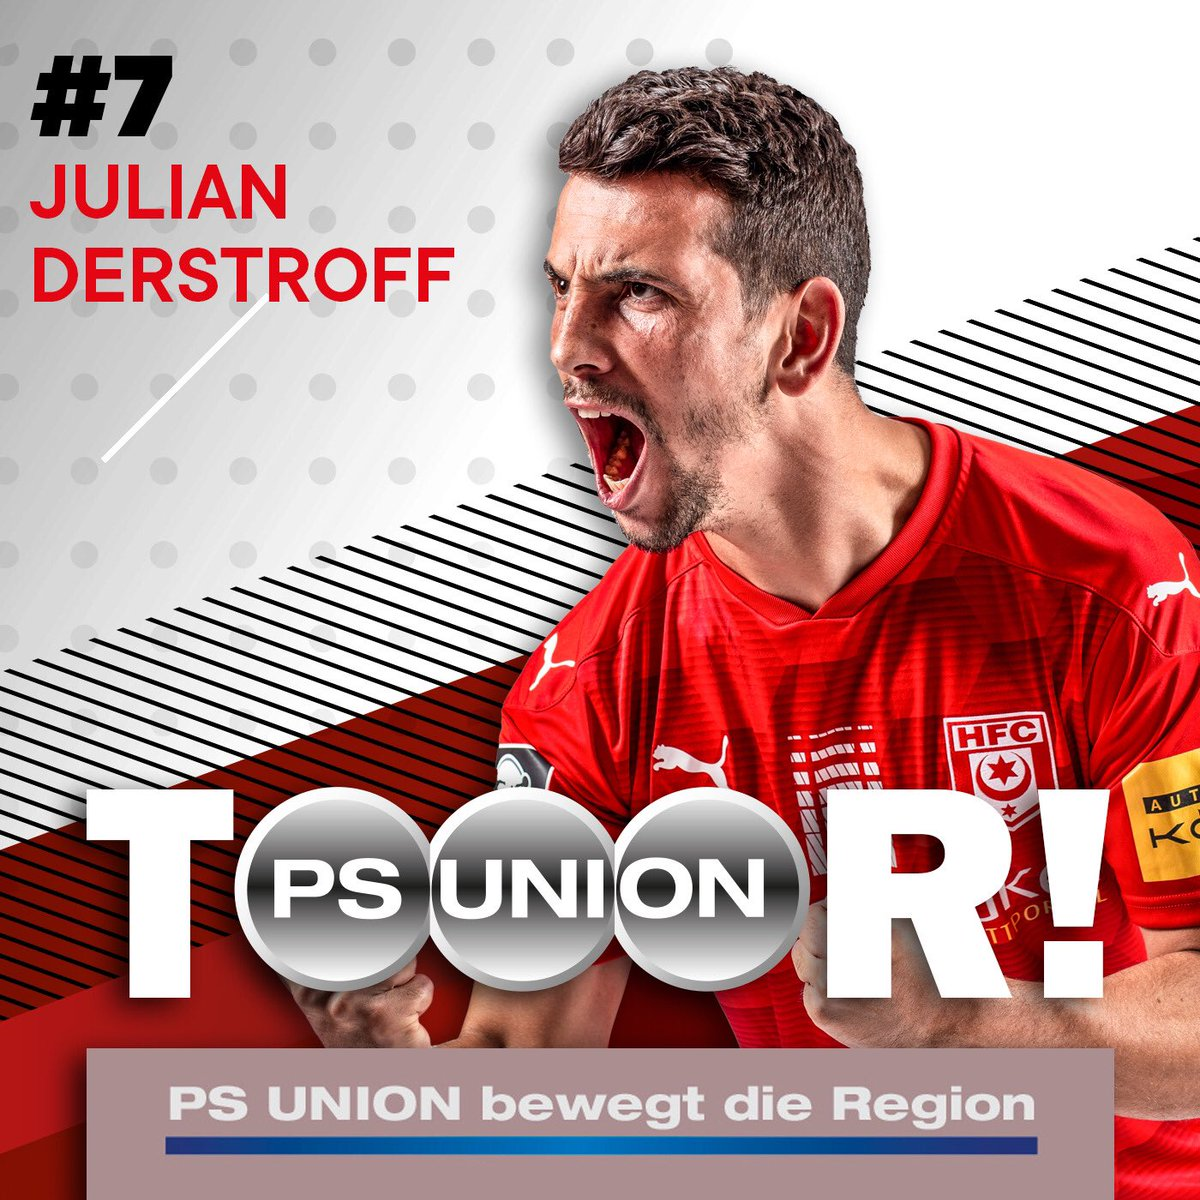 Hallescher FC @HallescherFC